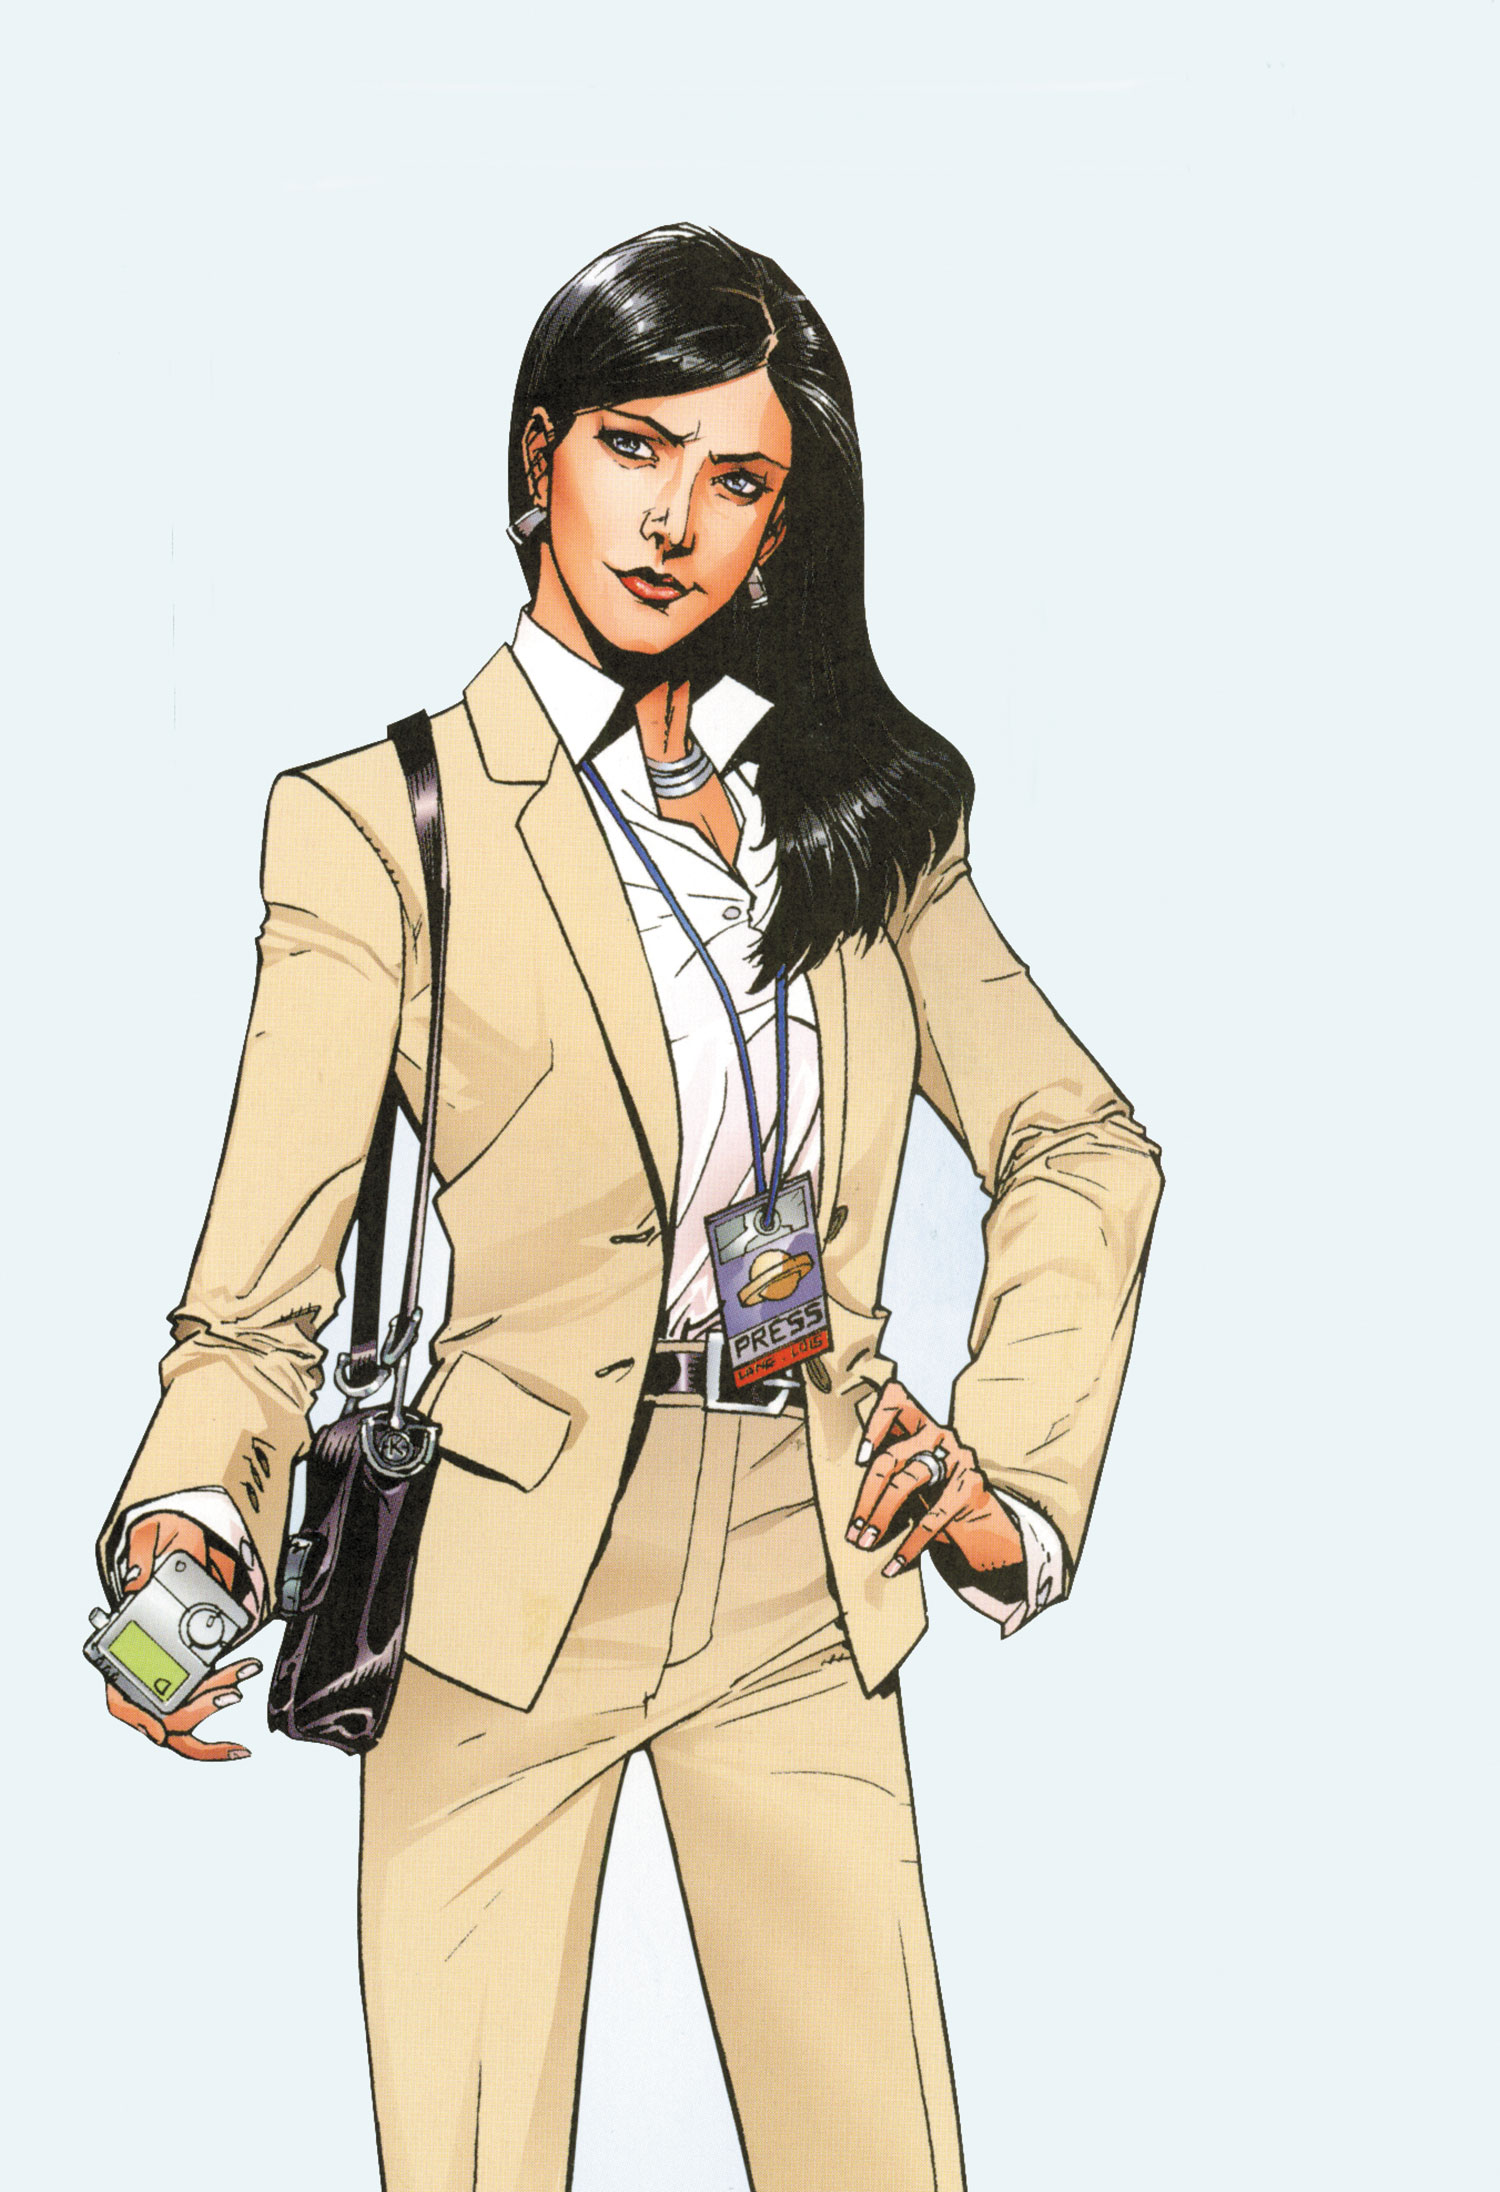 Lois Lane wallpapers Comics HQ Lois Lane pictures 4K 1500x2192